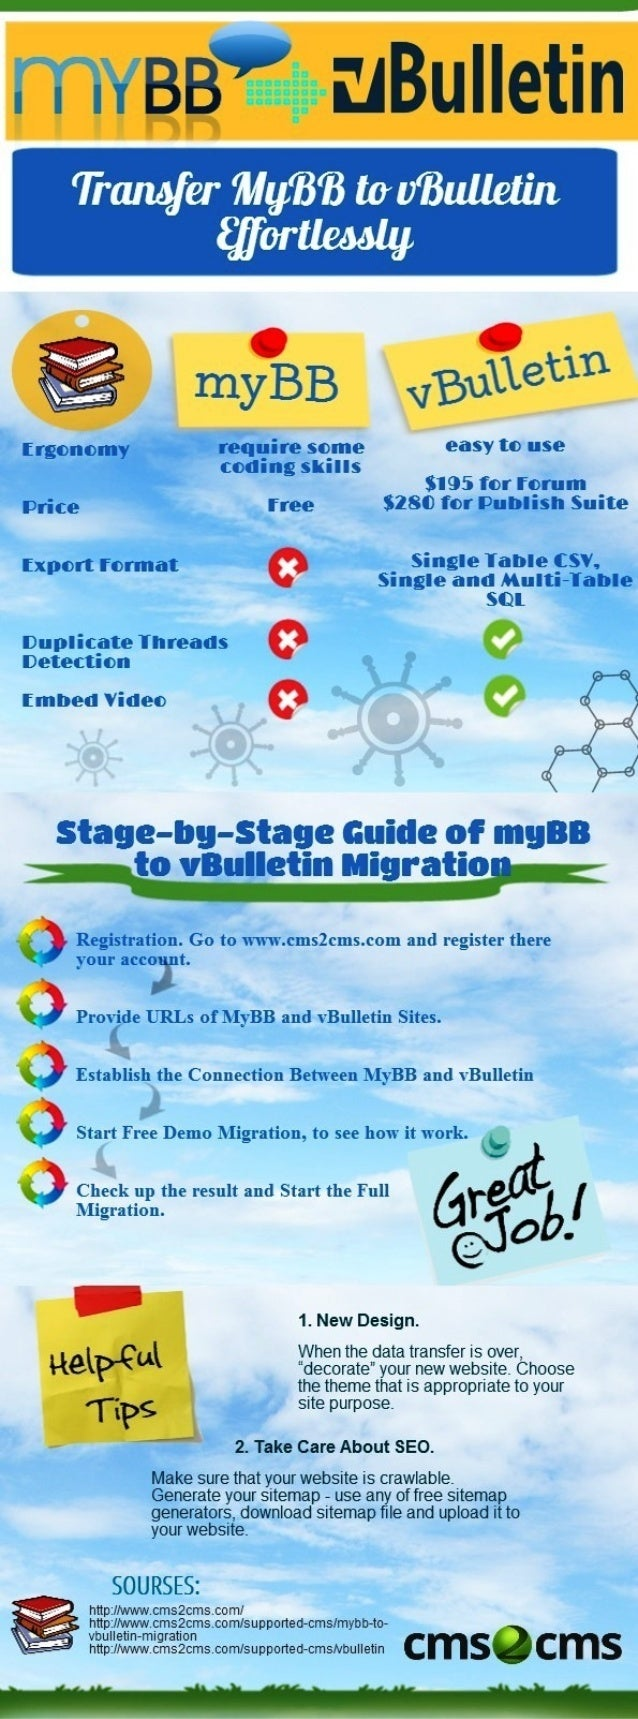 MyBB to vBulletin Migration Guide